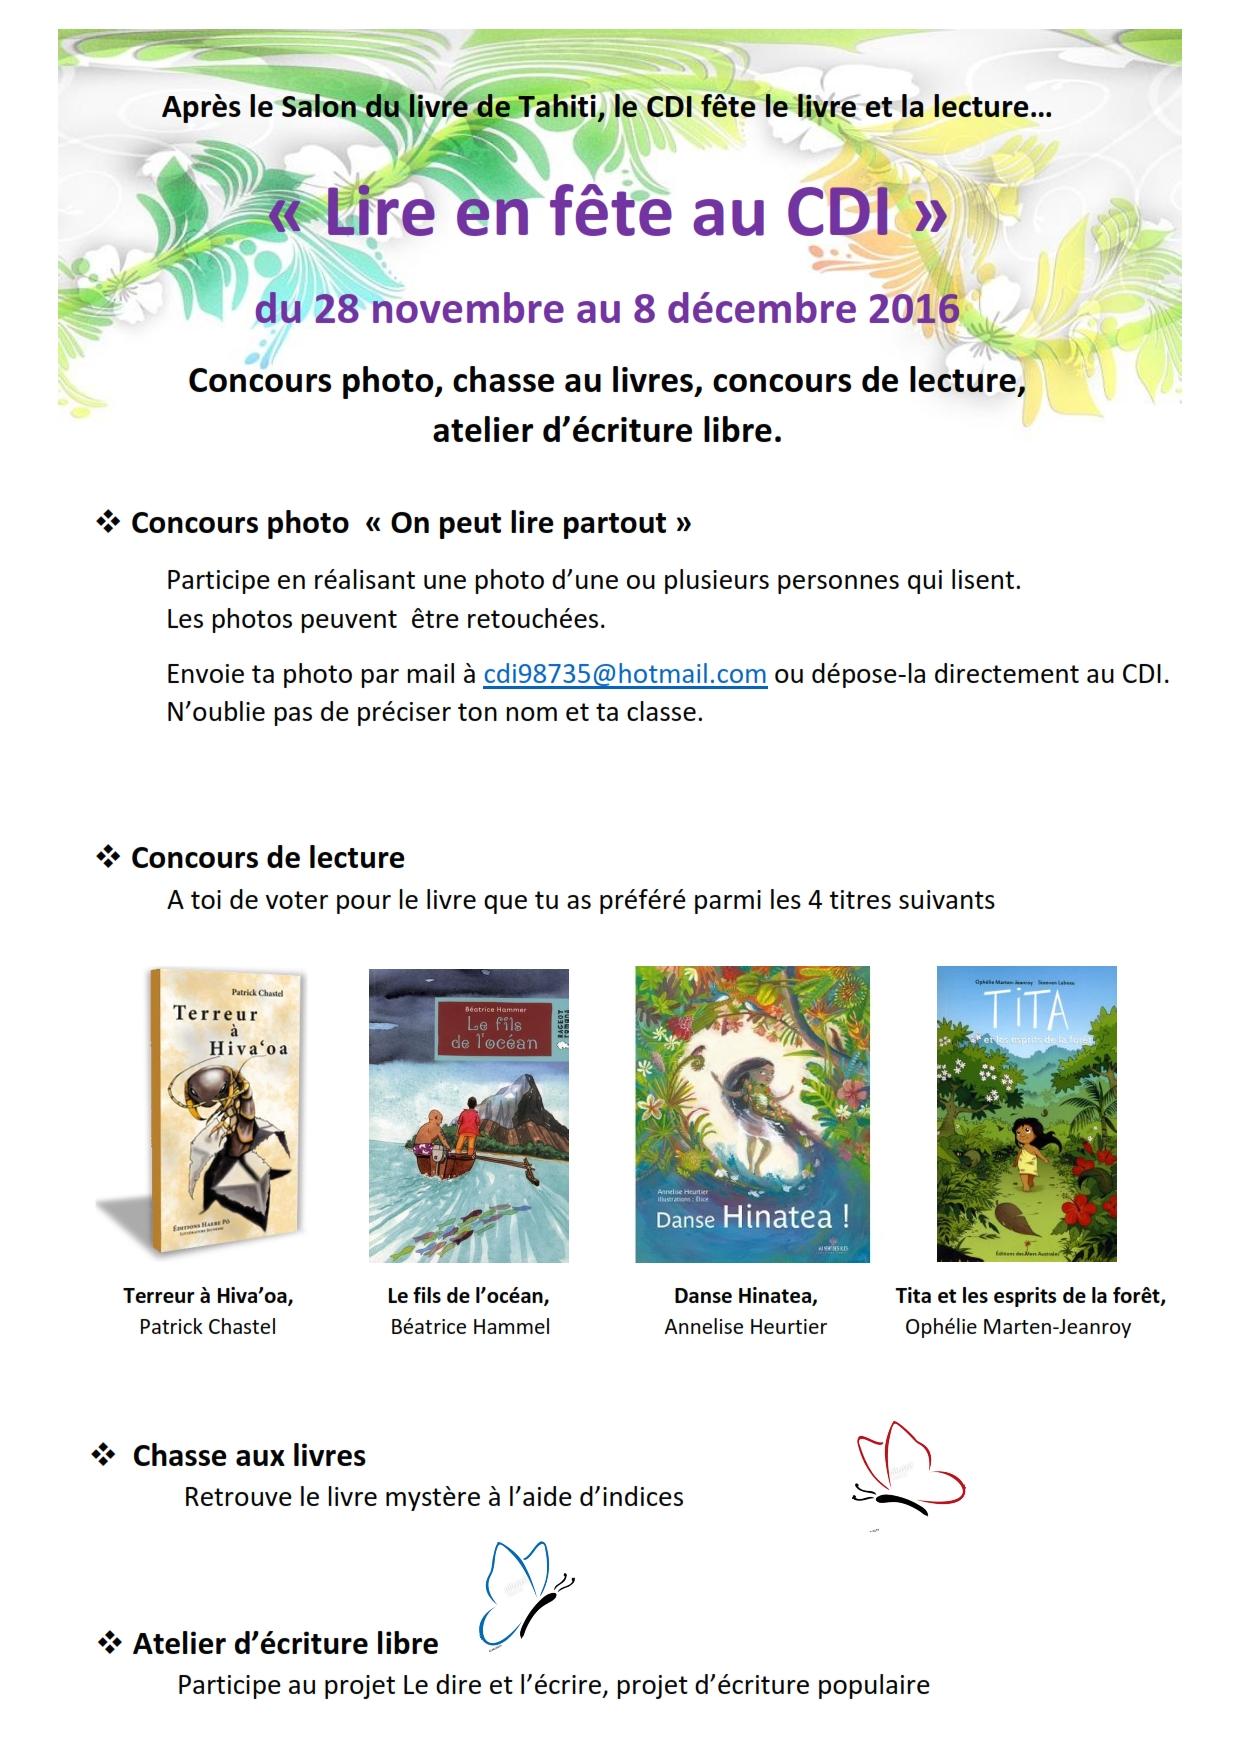 apres-le-salon-du-livre-de-tahiti_001